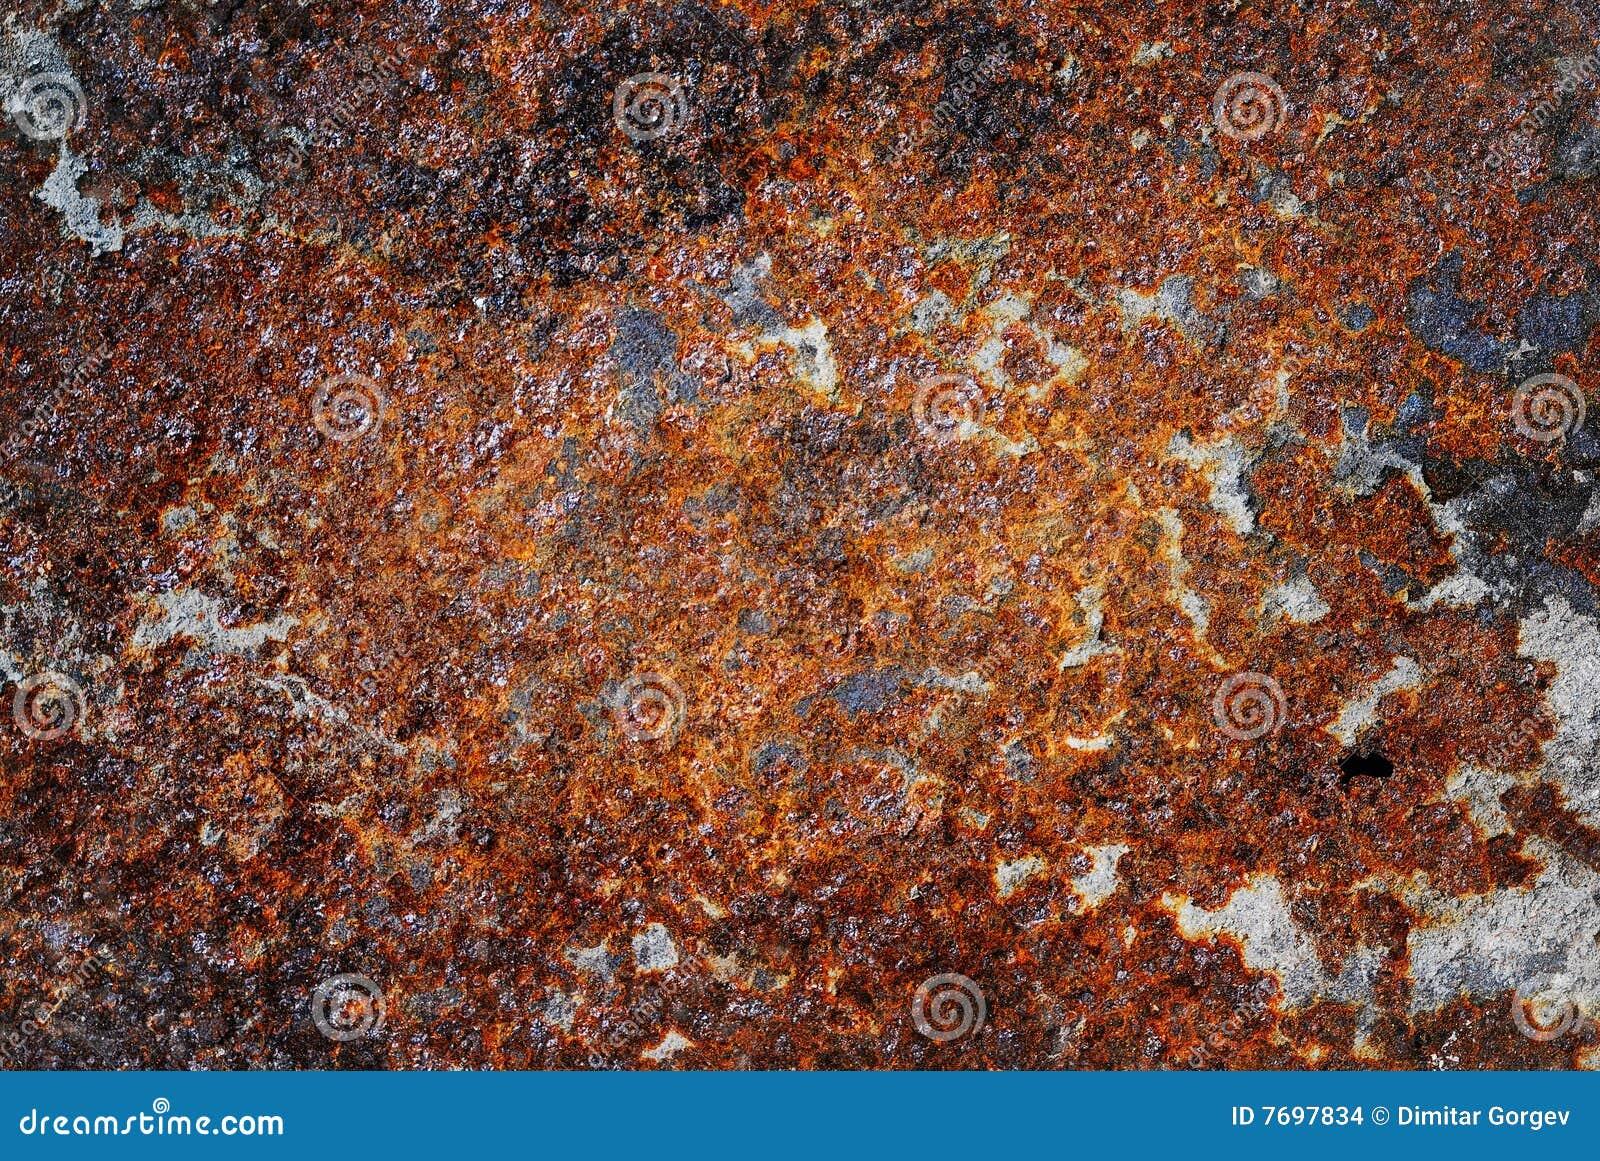 Oxidized Metal Stock Photo Image Of Colorful Grunge